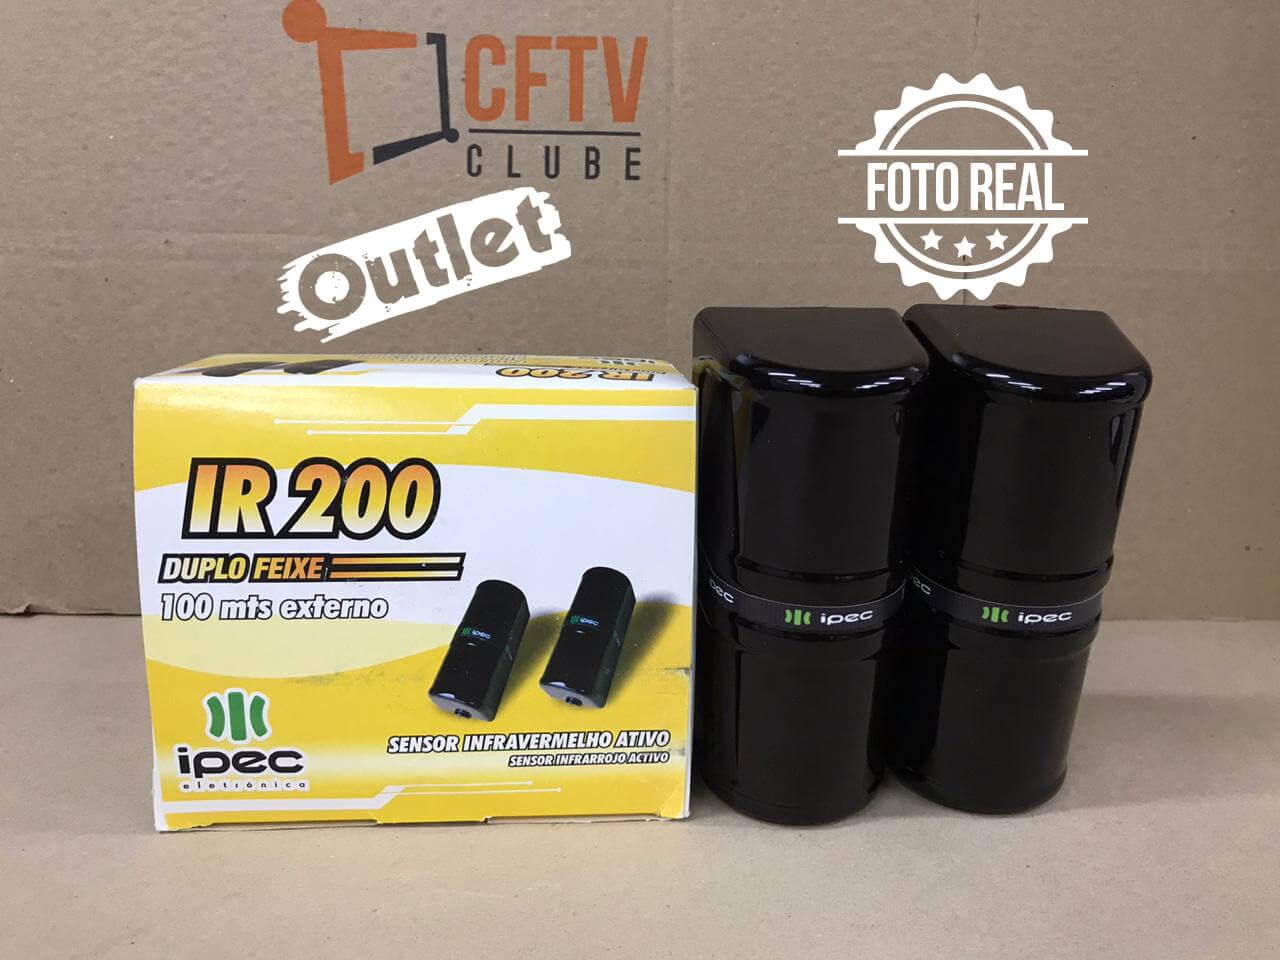 Outlet - Sensor de Barreira IPEC IR 200 Duplo Feixe IVA 100 Metros  - CFTV Clube | Brasil